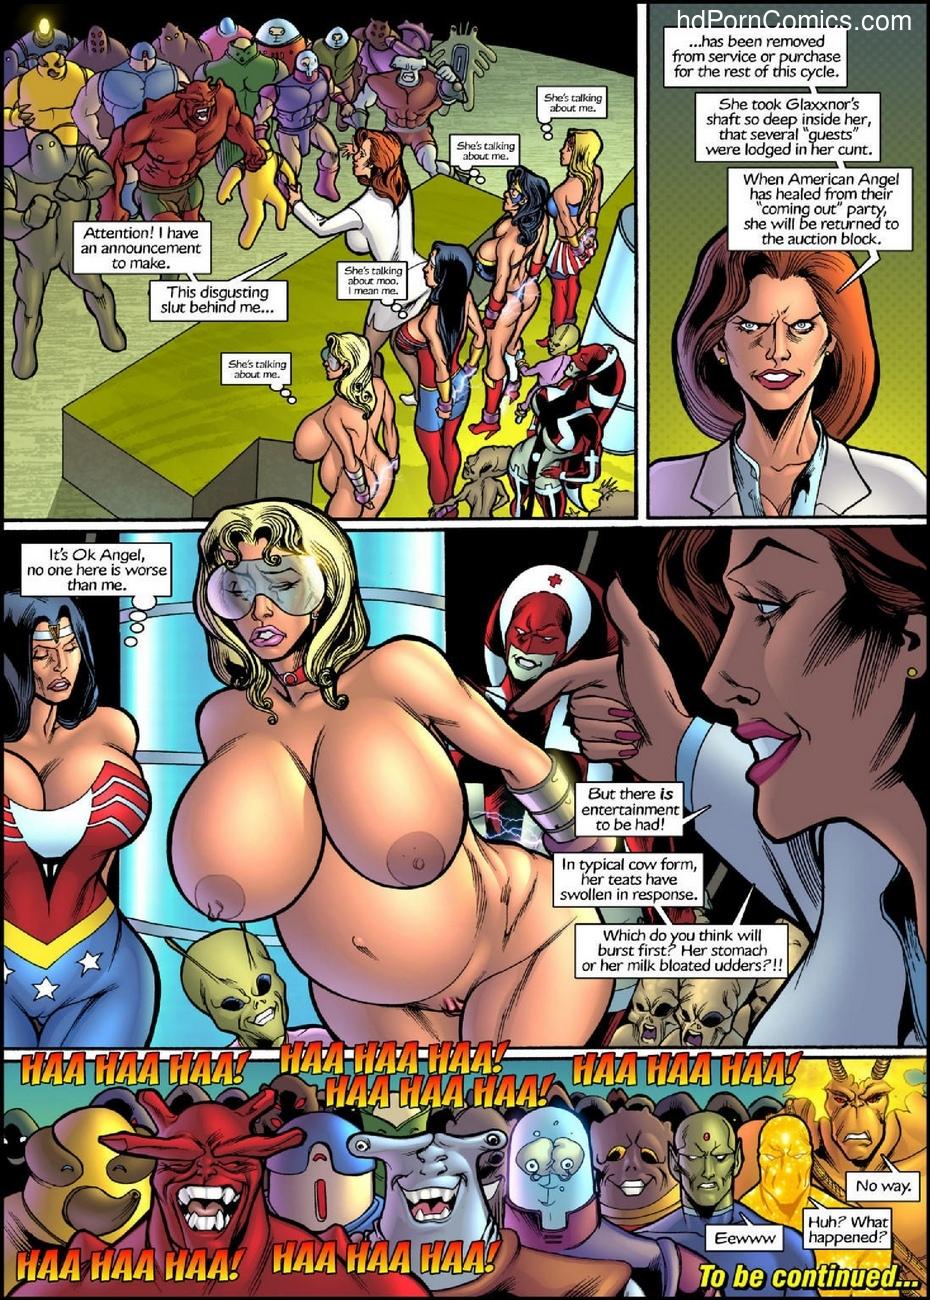 Freedom Stars - Cattle Call 1 47 free sex comic